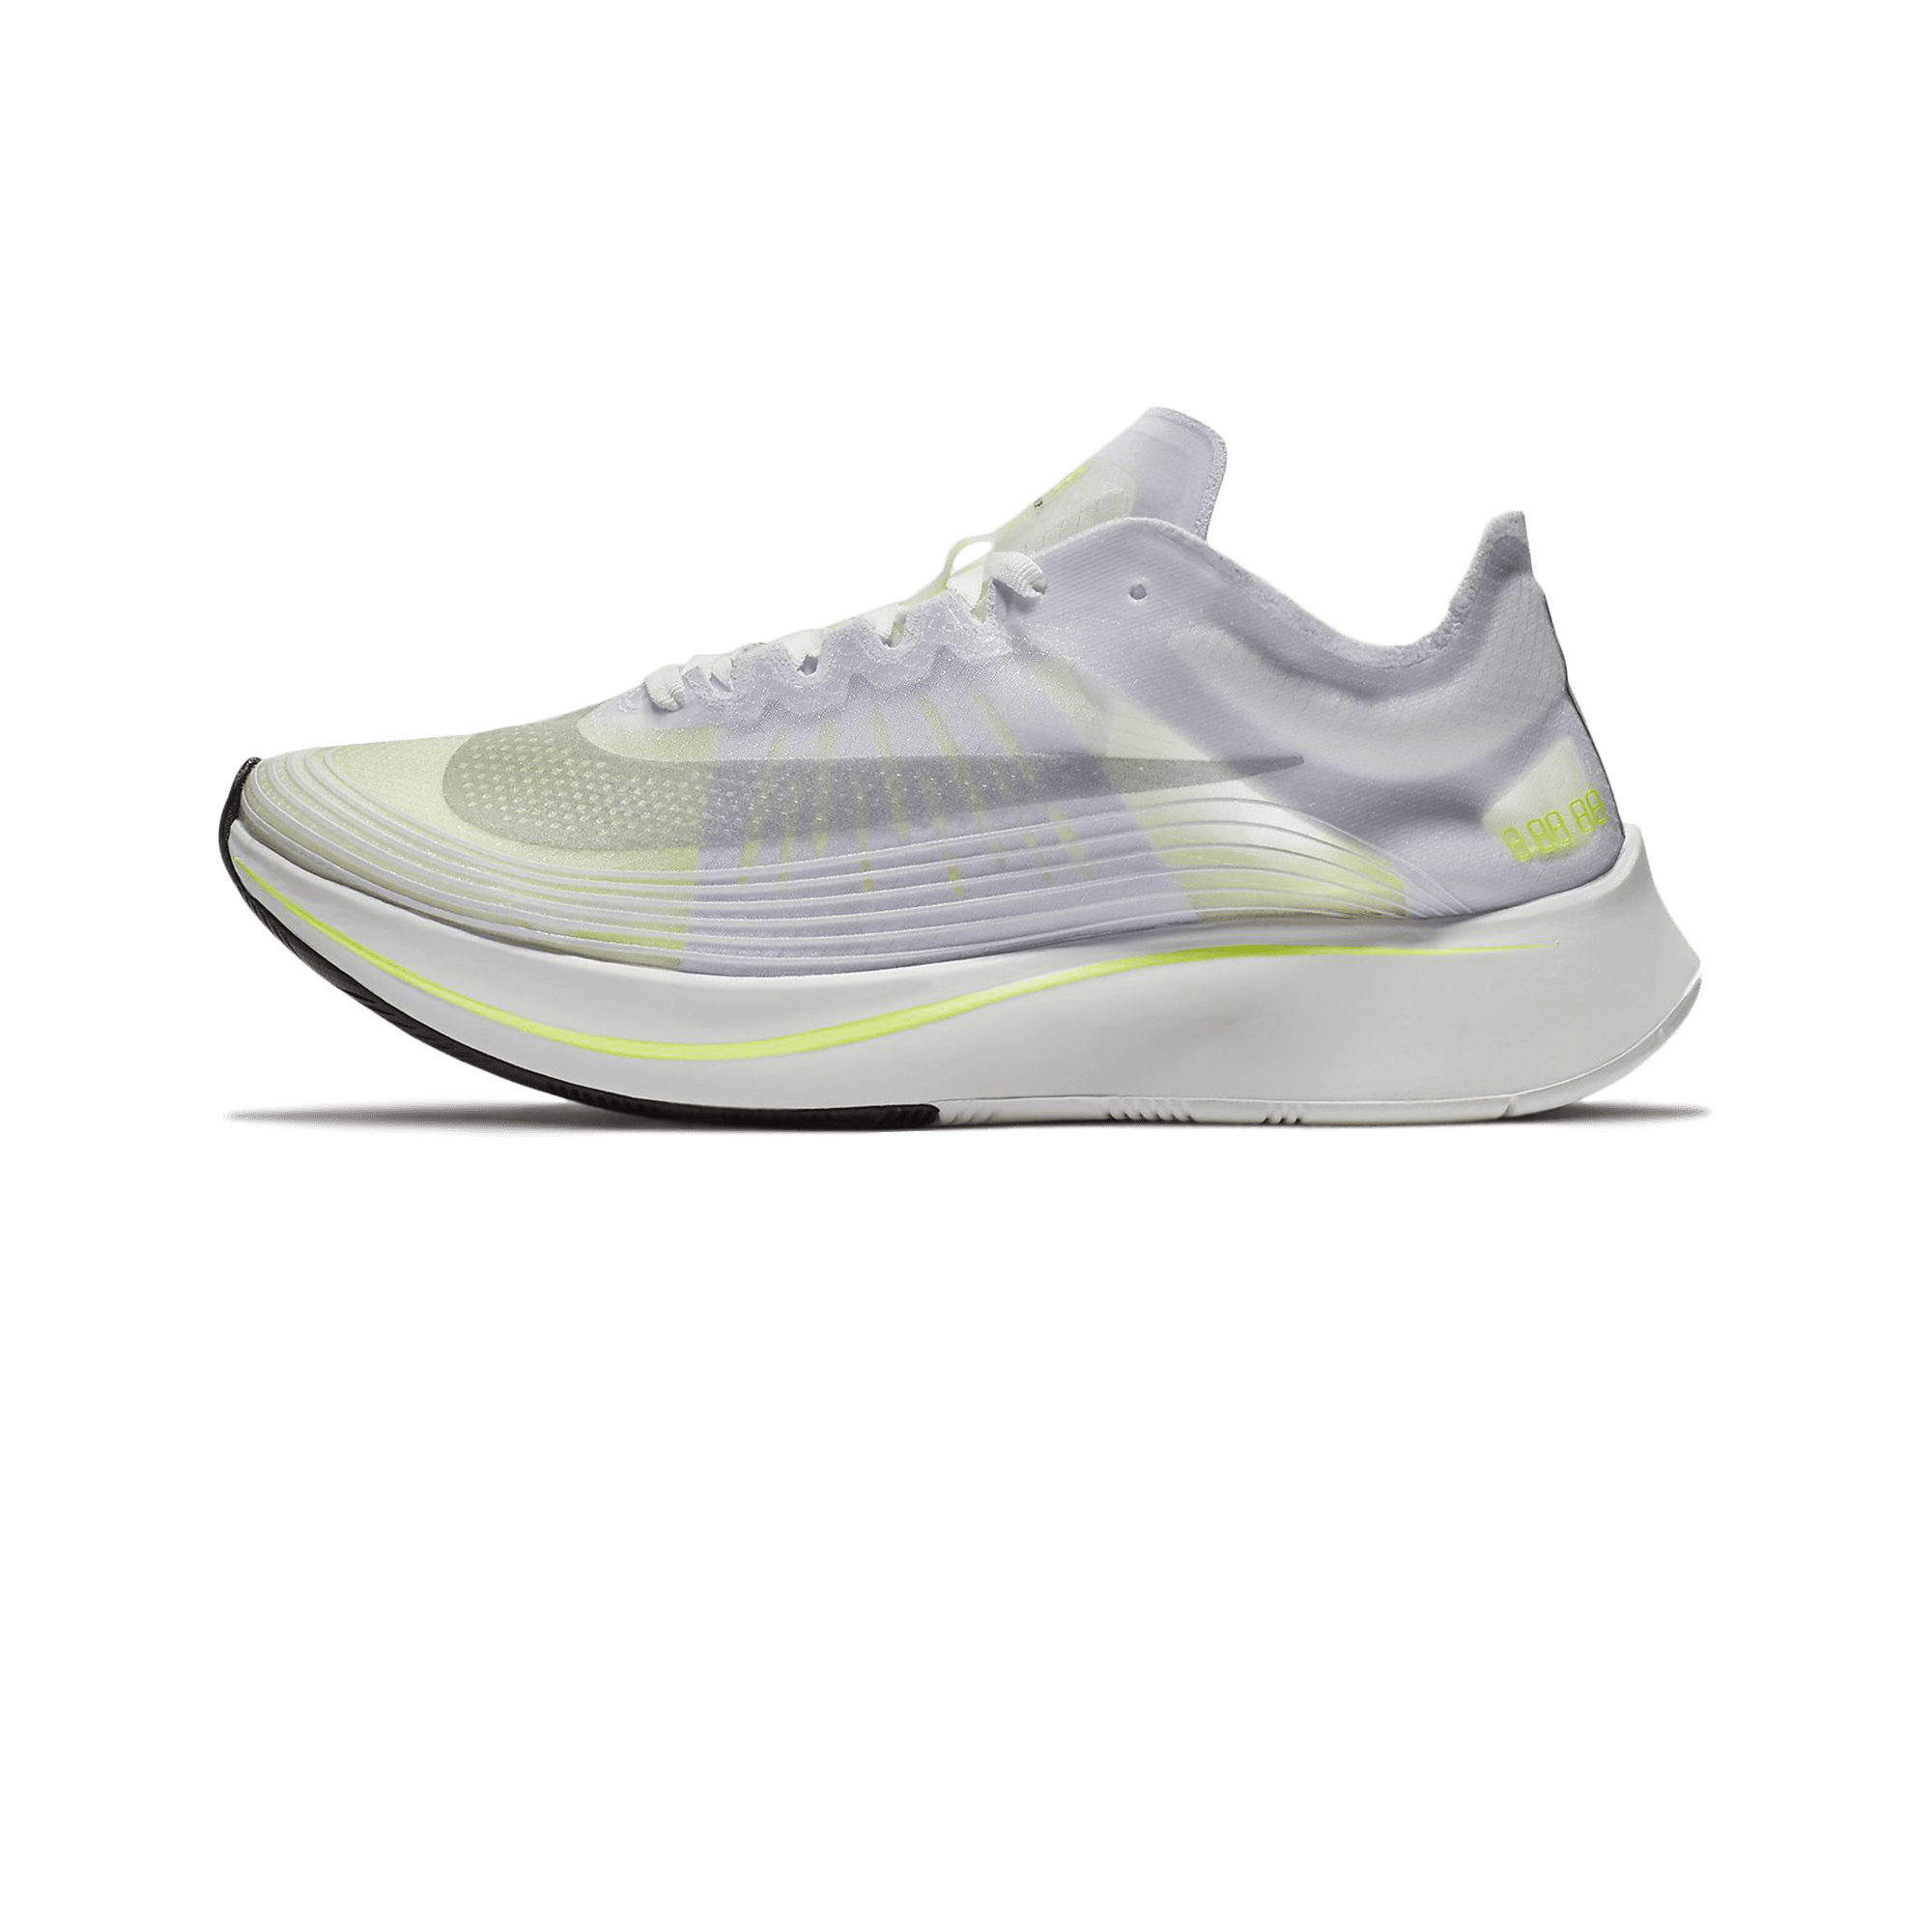 plus de photos fa3ca e4ce7 Nike Zoom Fly SP W white / volt glow / summit white - Woman |  Holypopstore.com